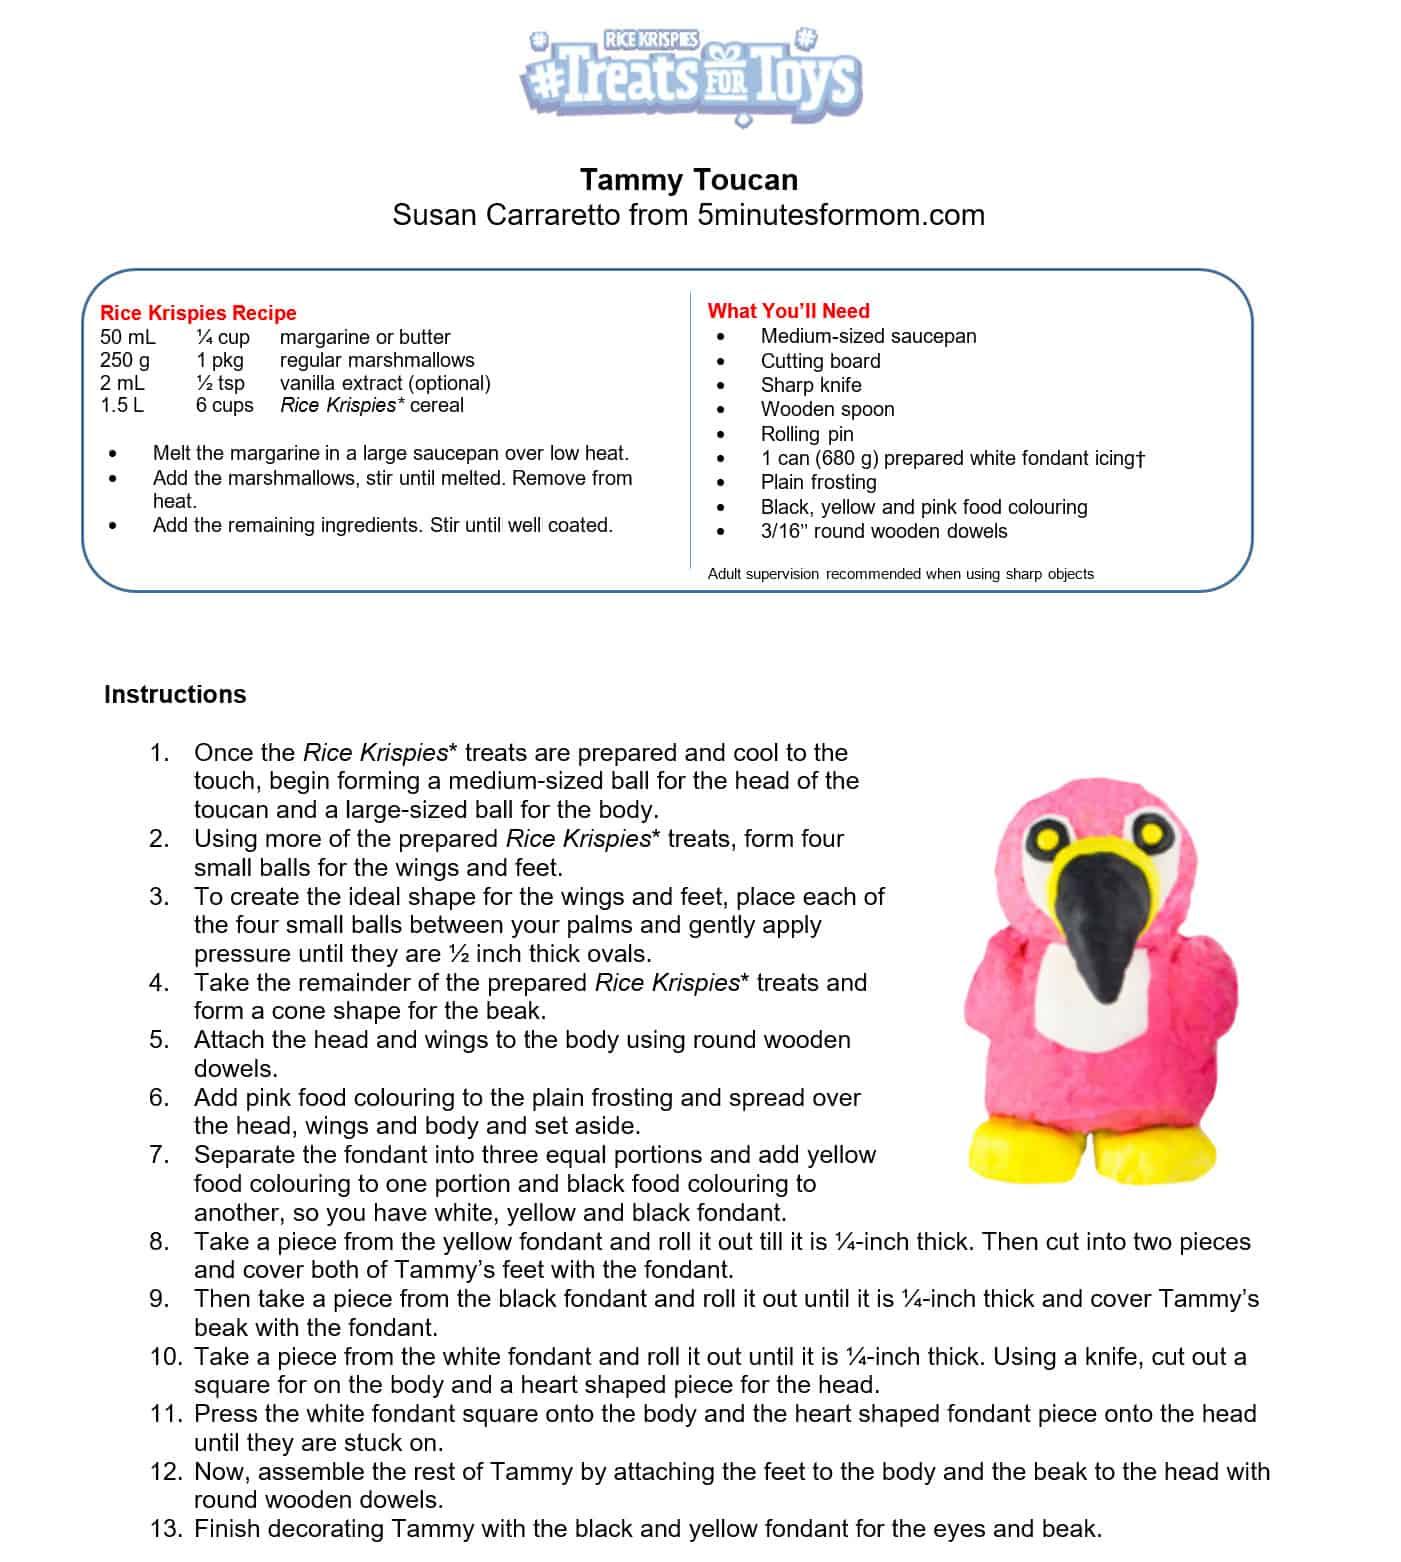 tammy-toucan-rice-krispies-treats-recipe-5m4m